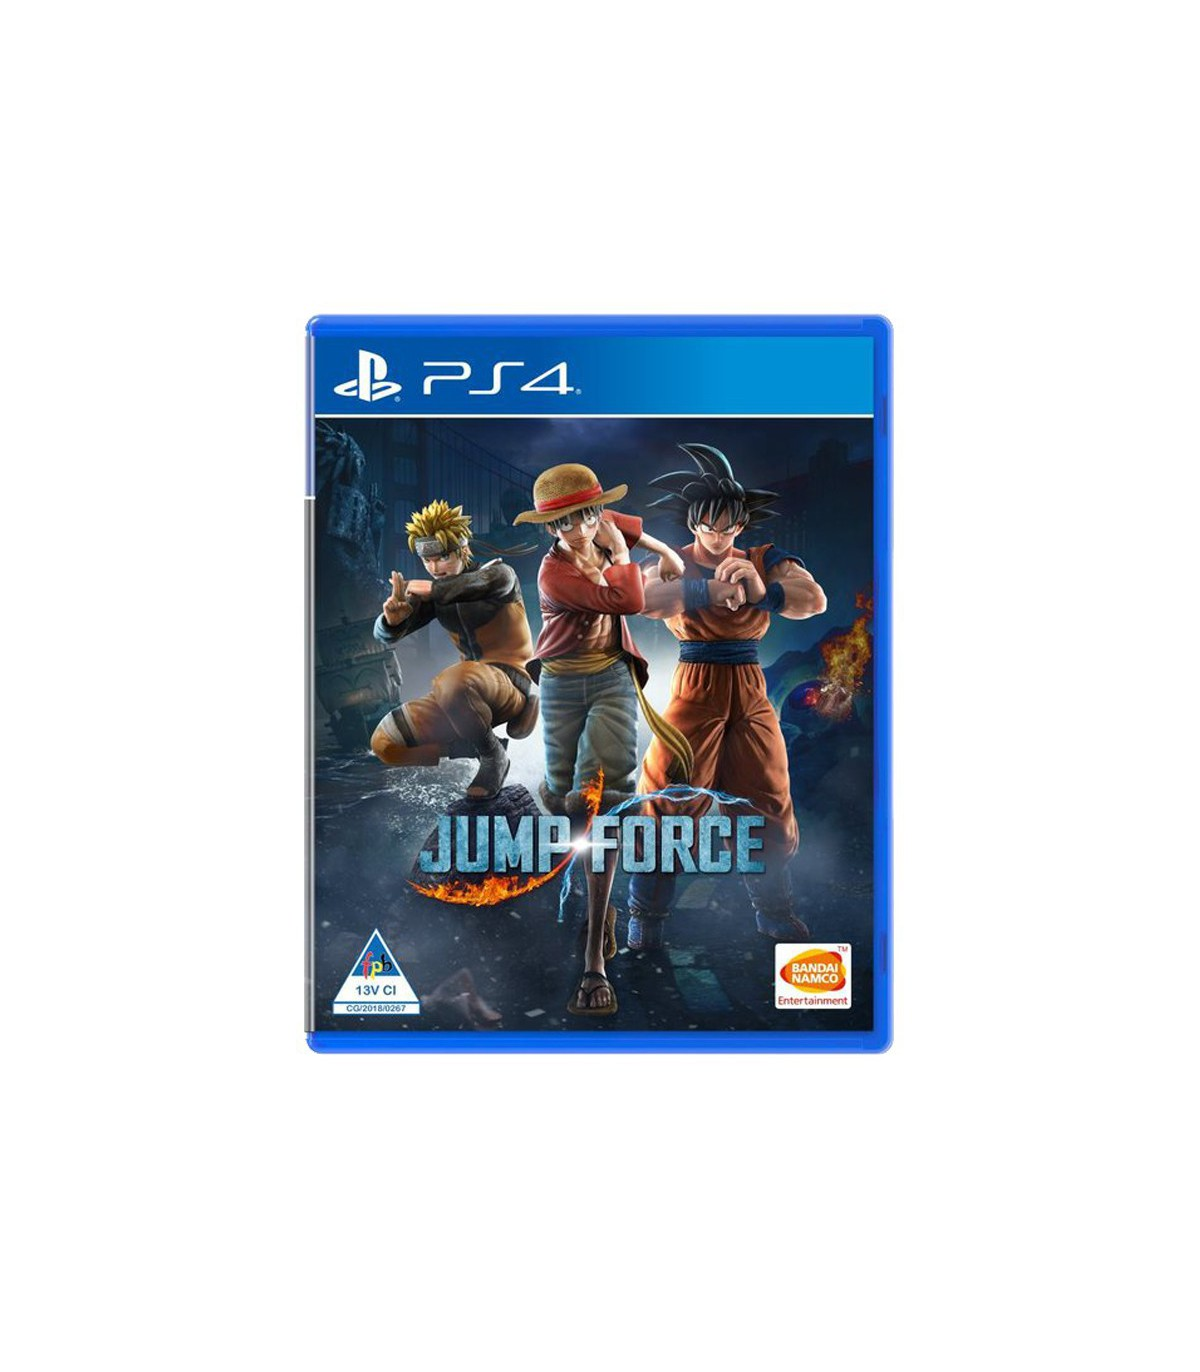 بازی Jump Force کارکرده - پلی استیشن 4